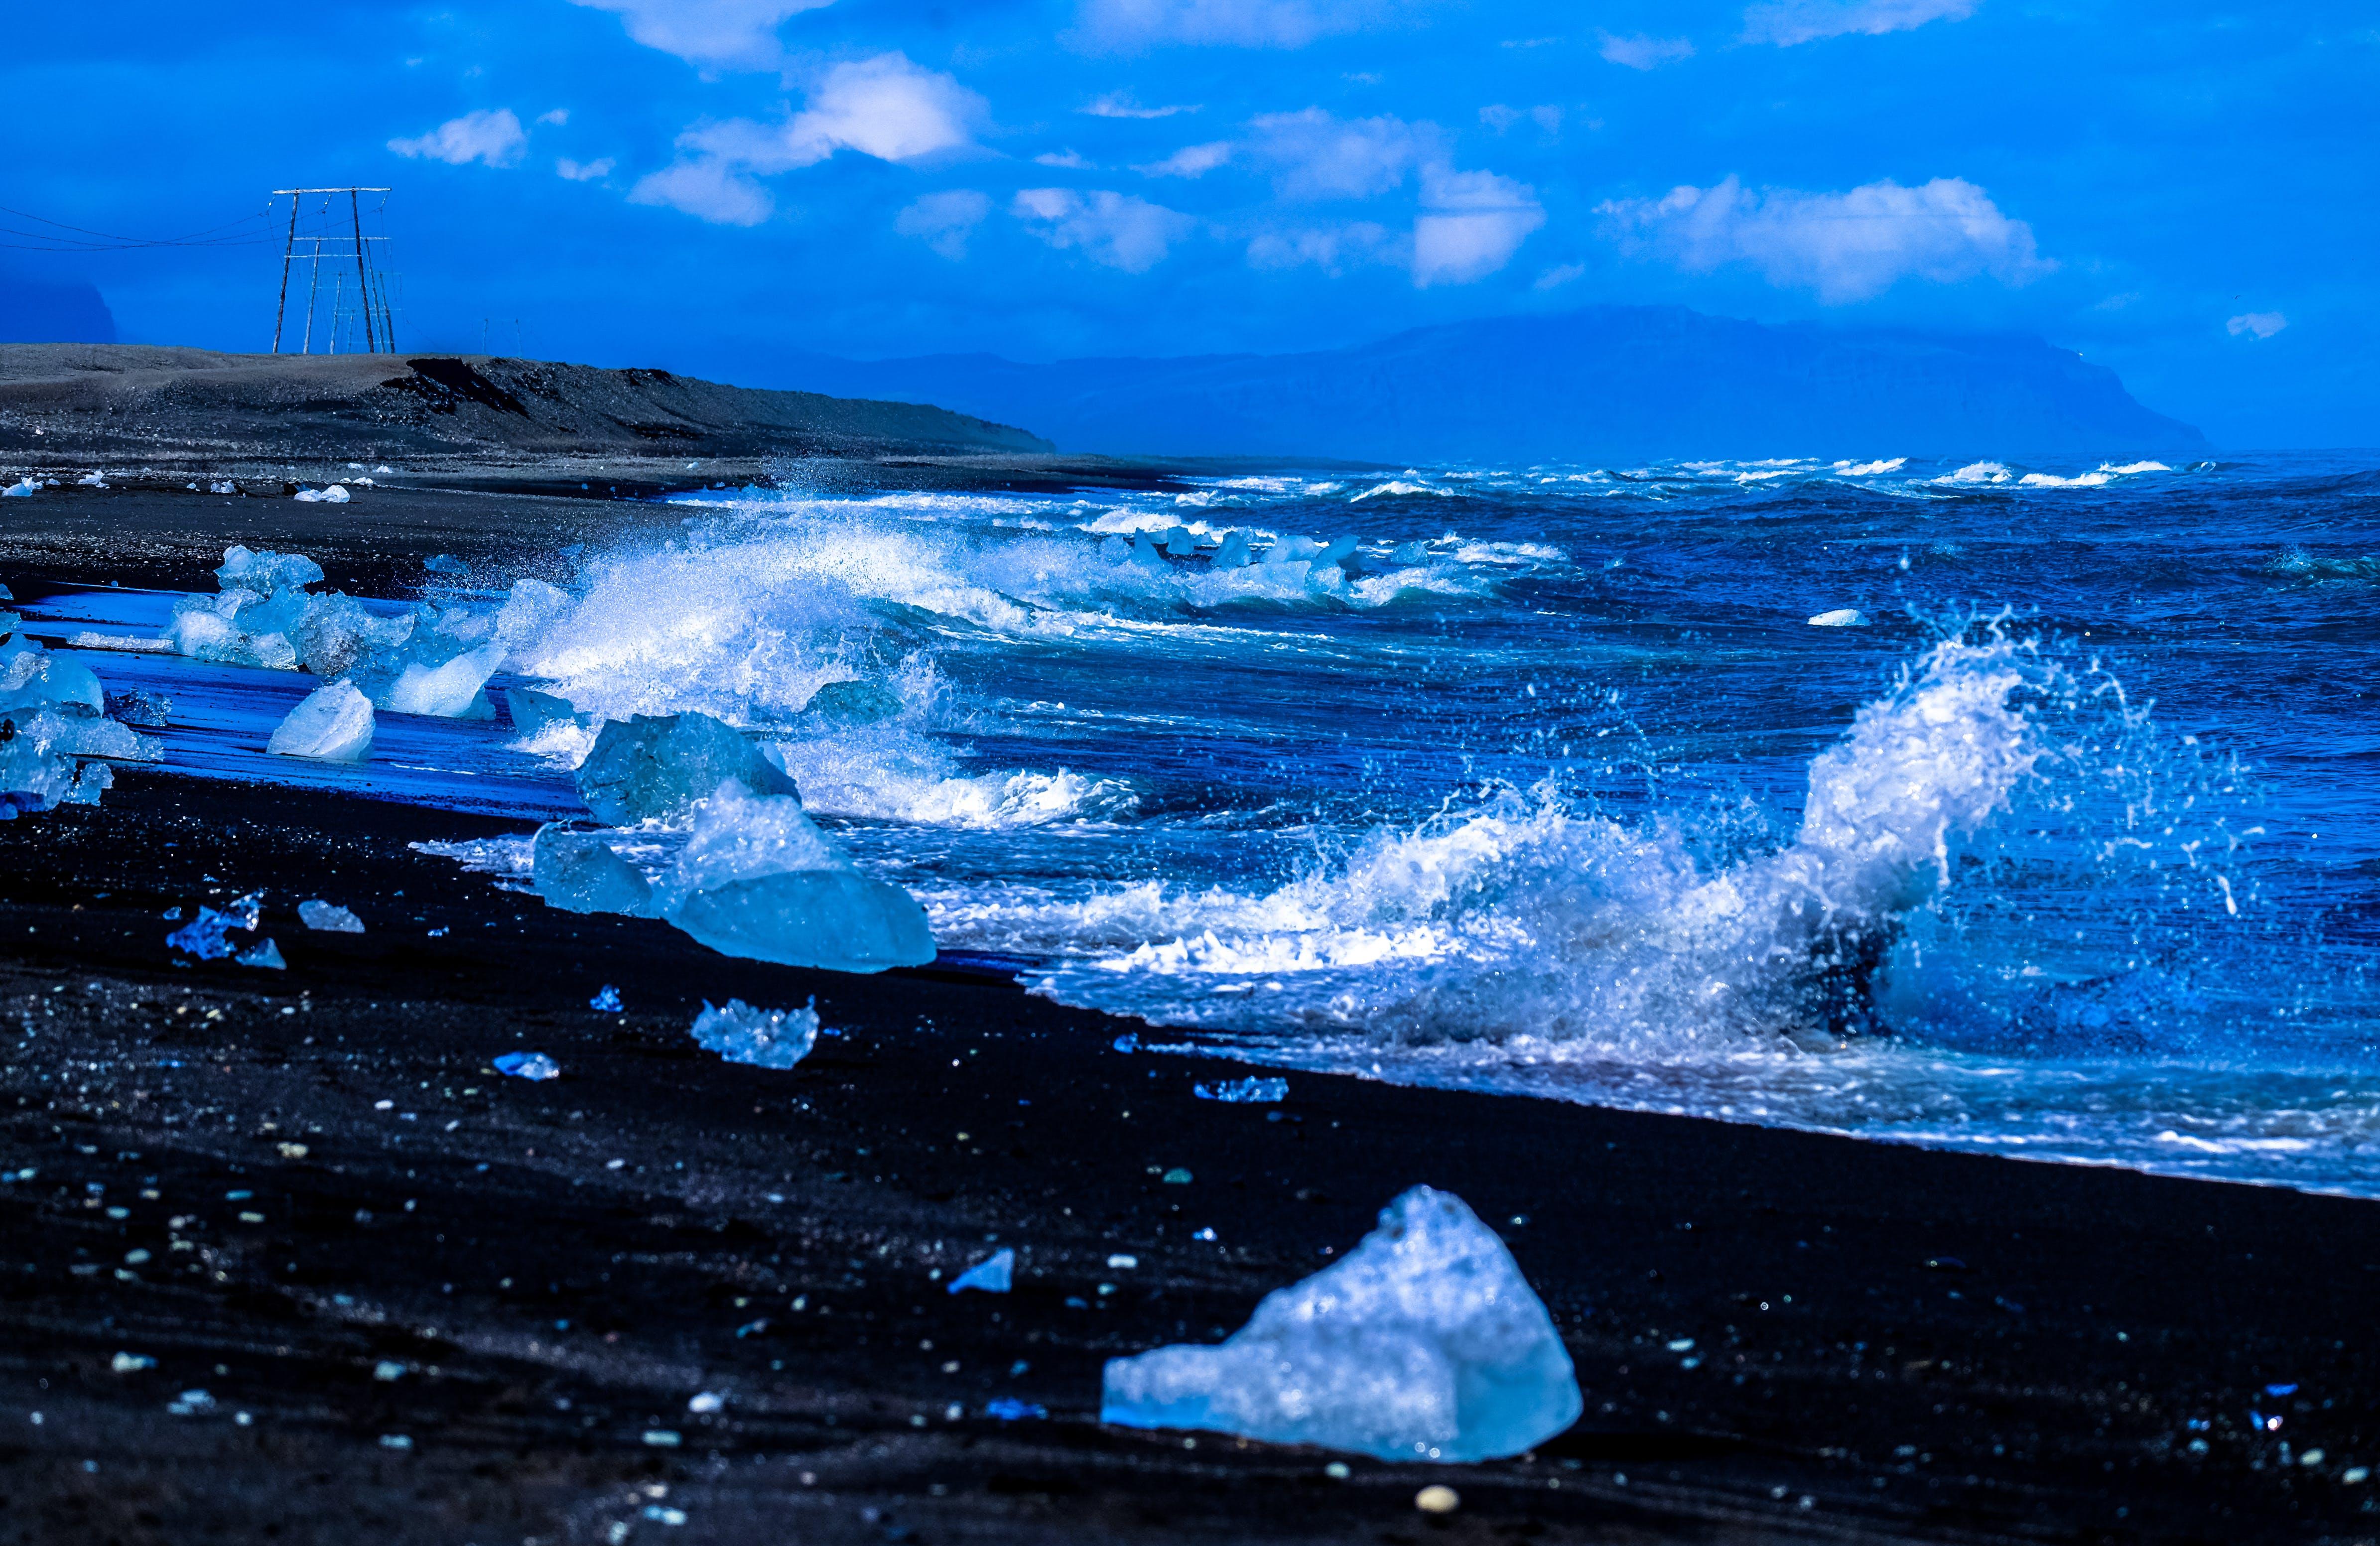 Ice Shards Near Body of Water